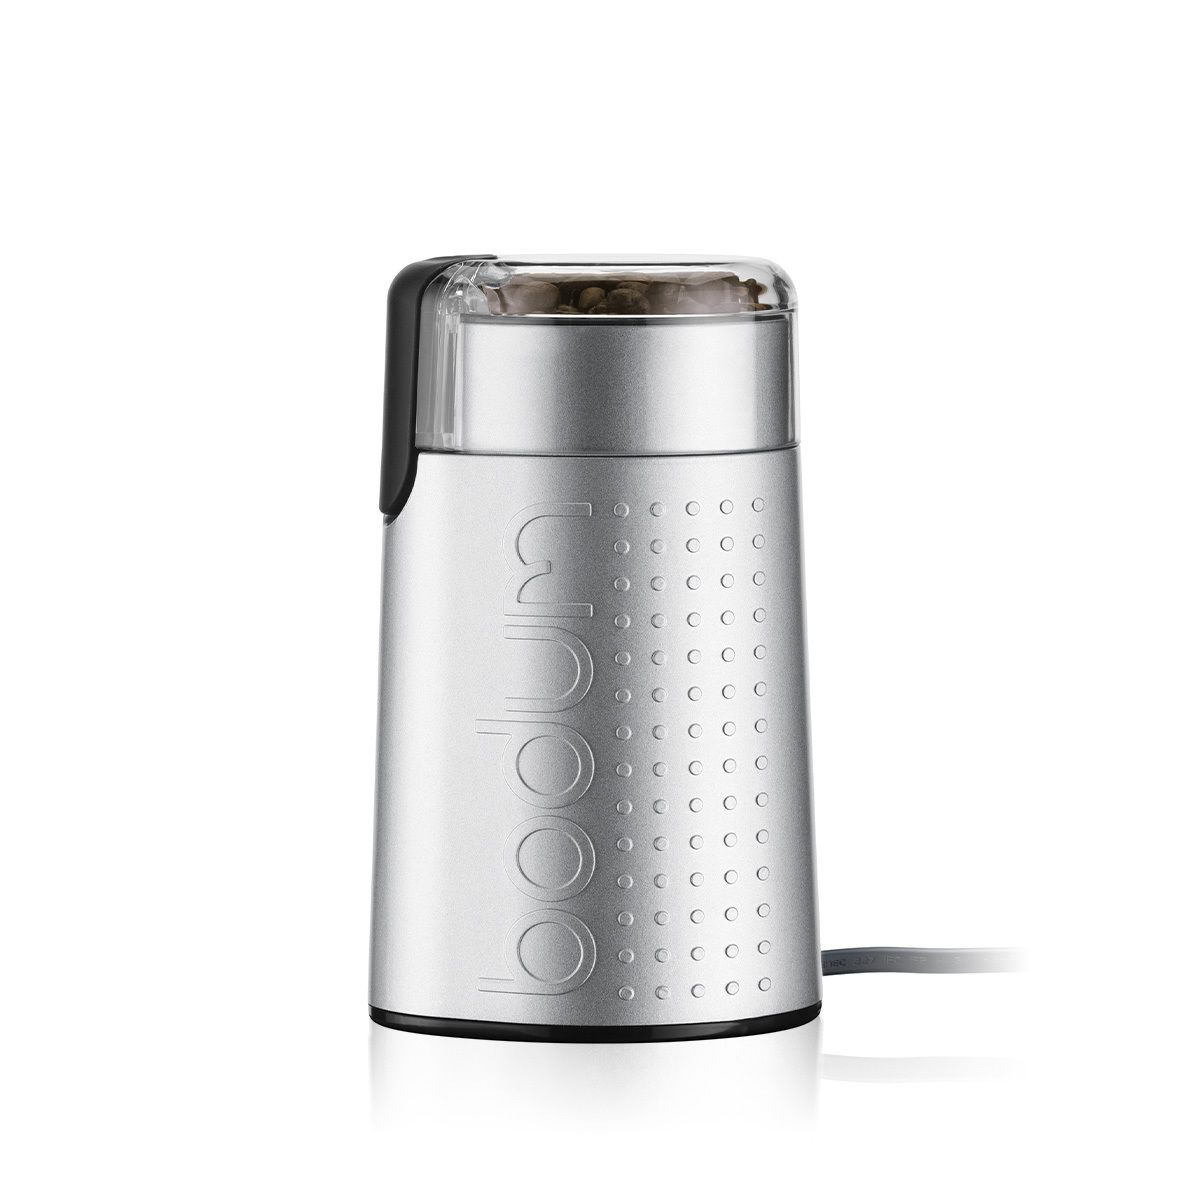 electric coffee grinder Bodum